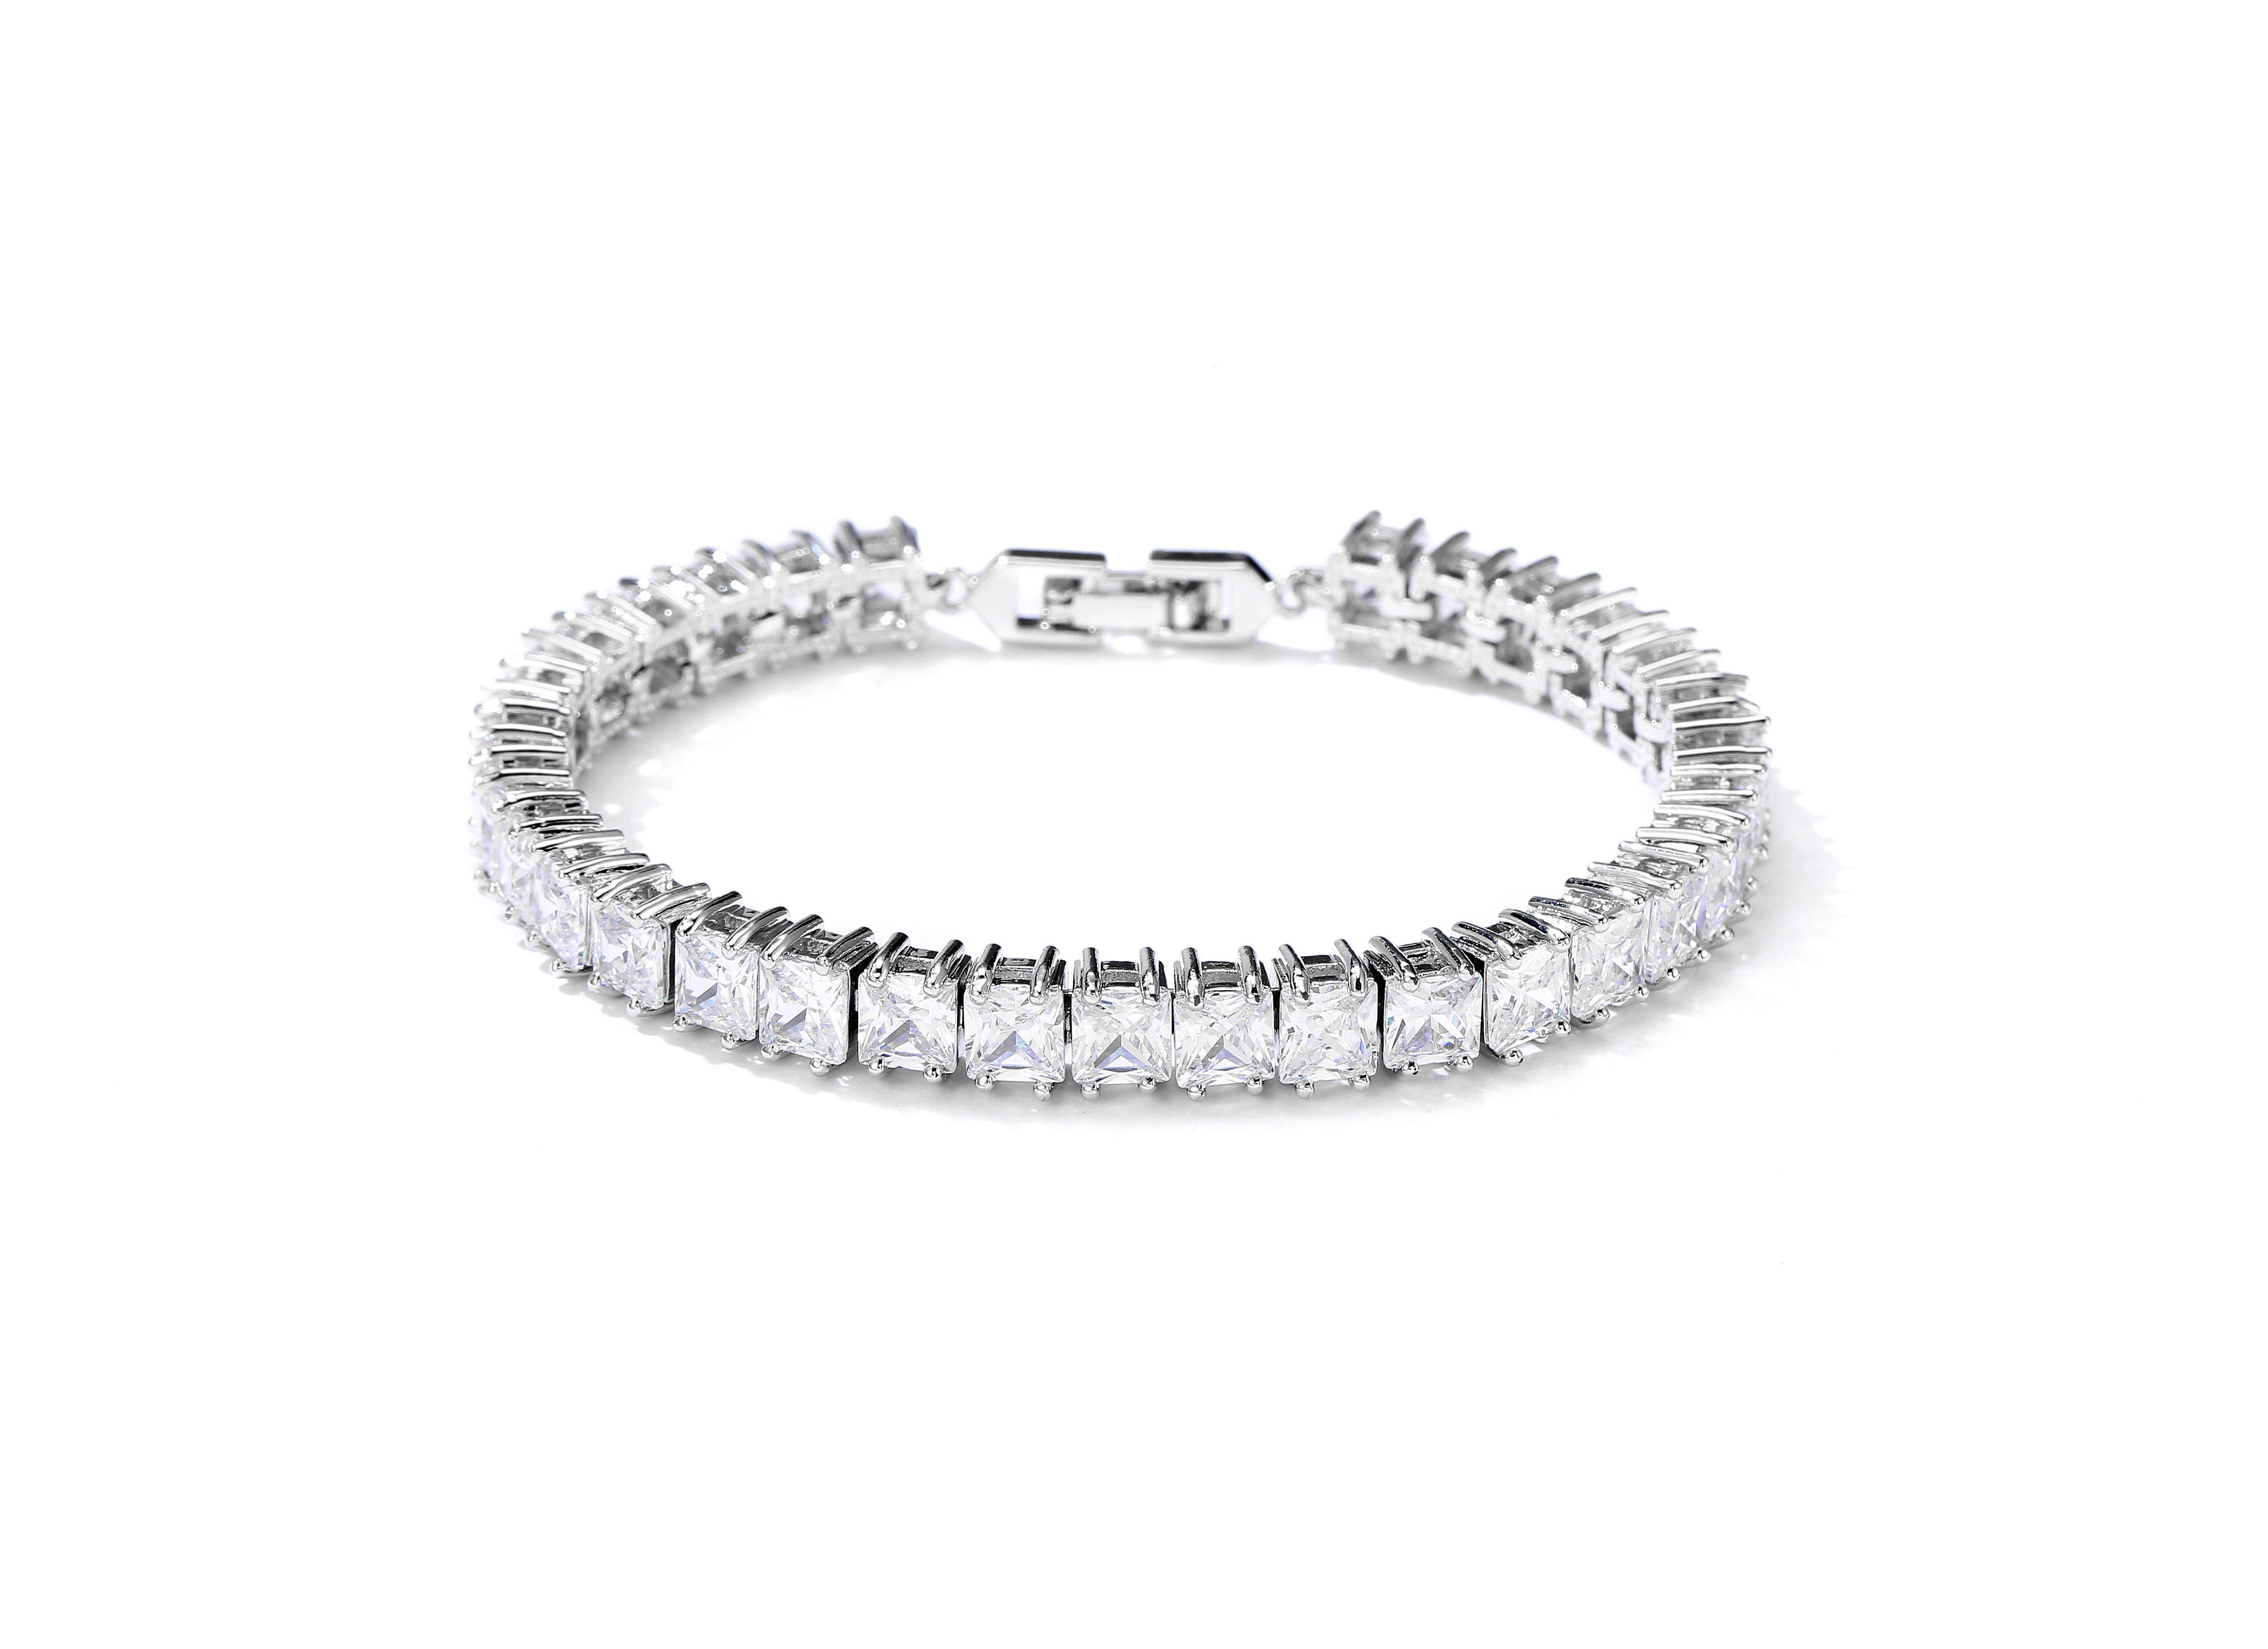 6fba882d8ad24 [Hot Item] Square Princess Cut White Cubic Zirconia Tennis Bracelet 18K  Whtie Gold & Rhodium Plated Silver